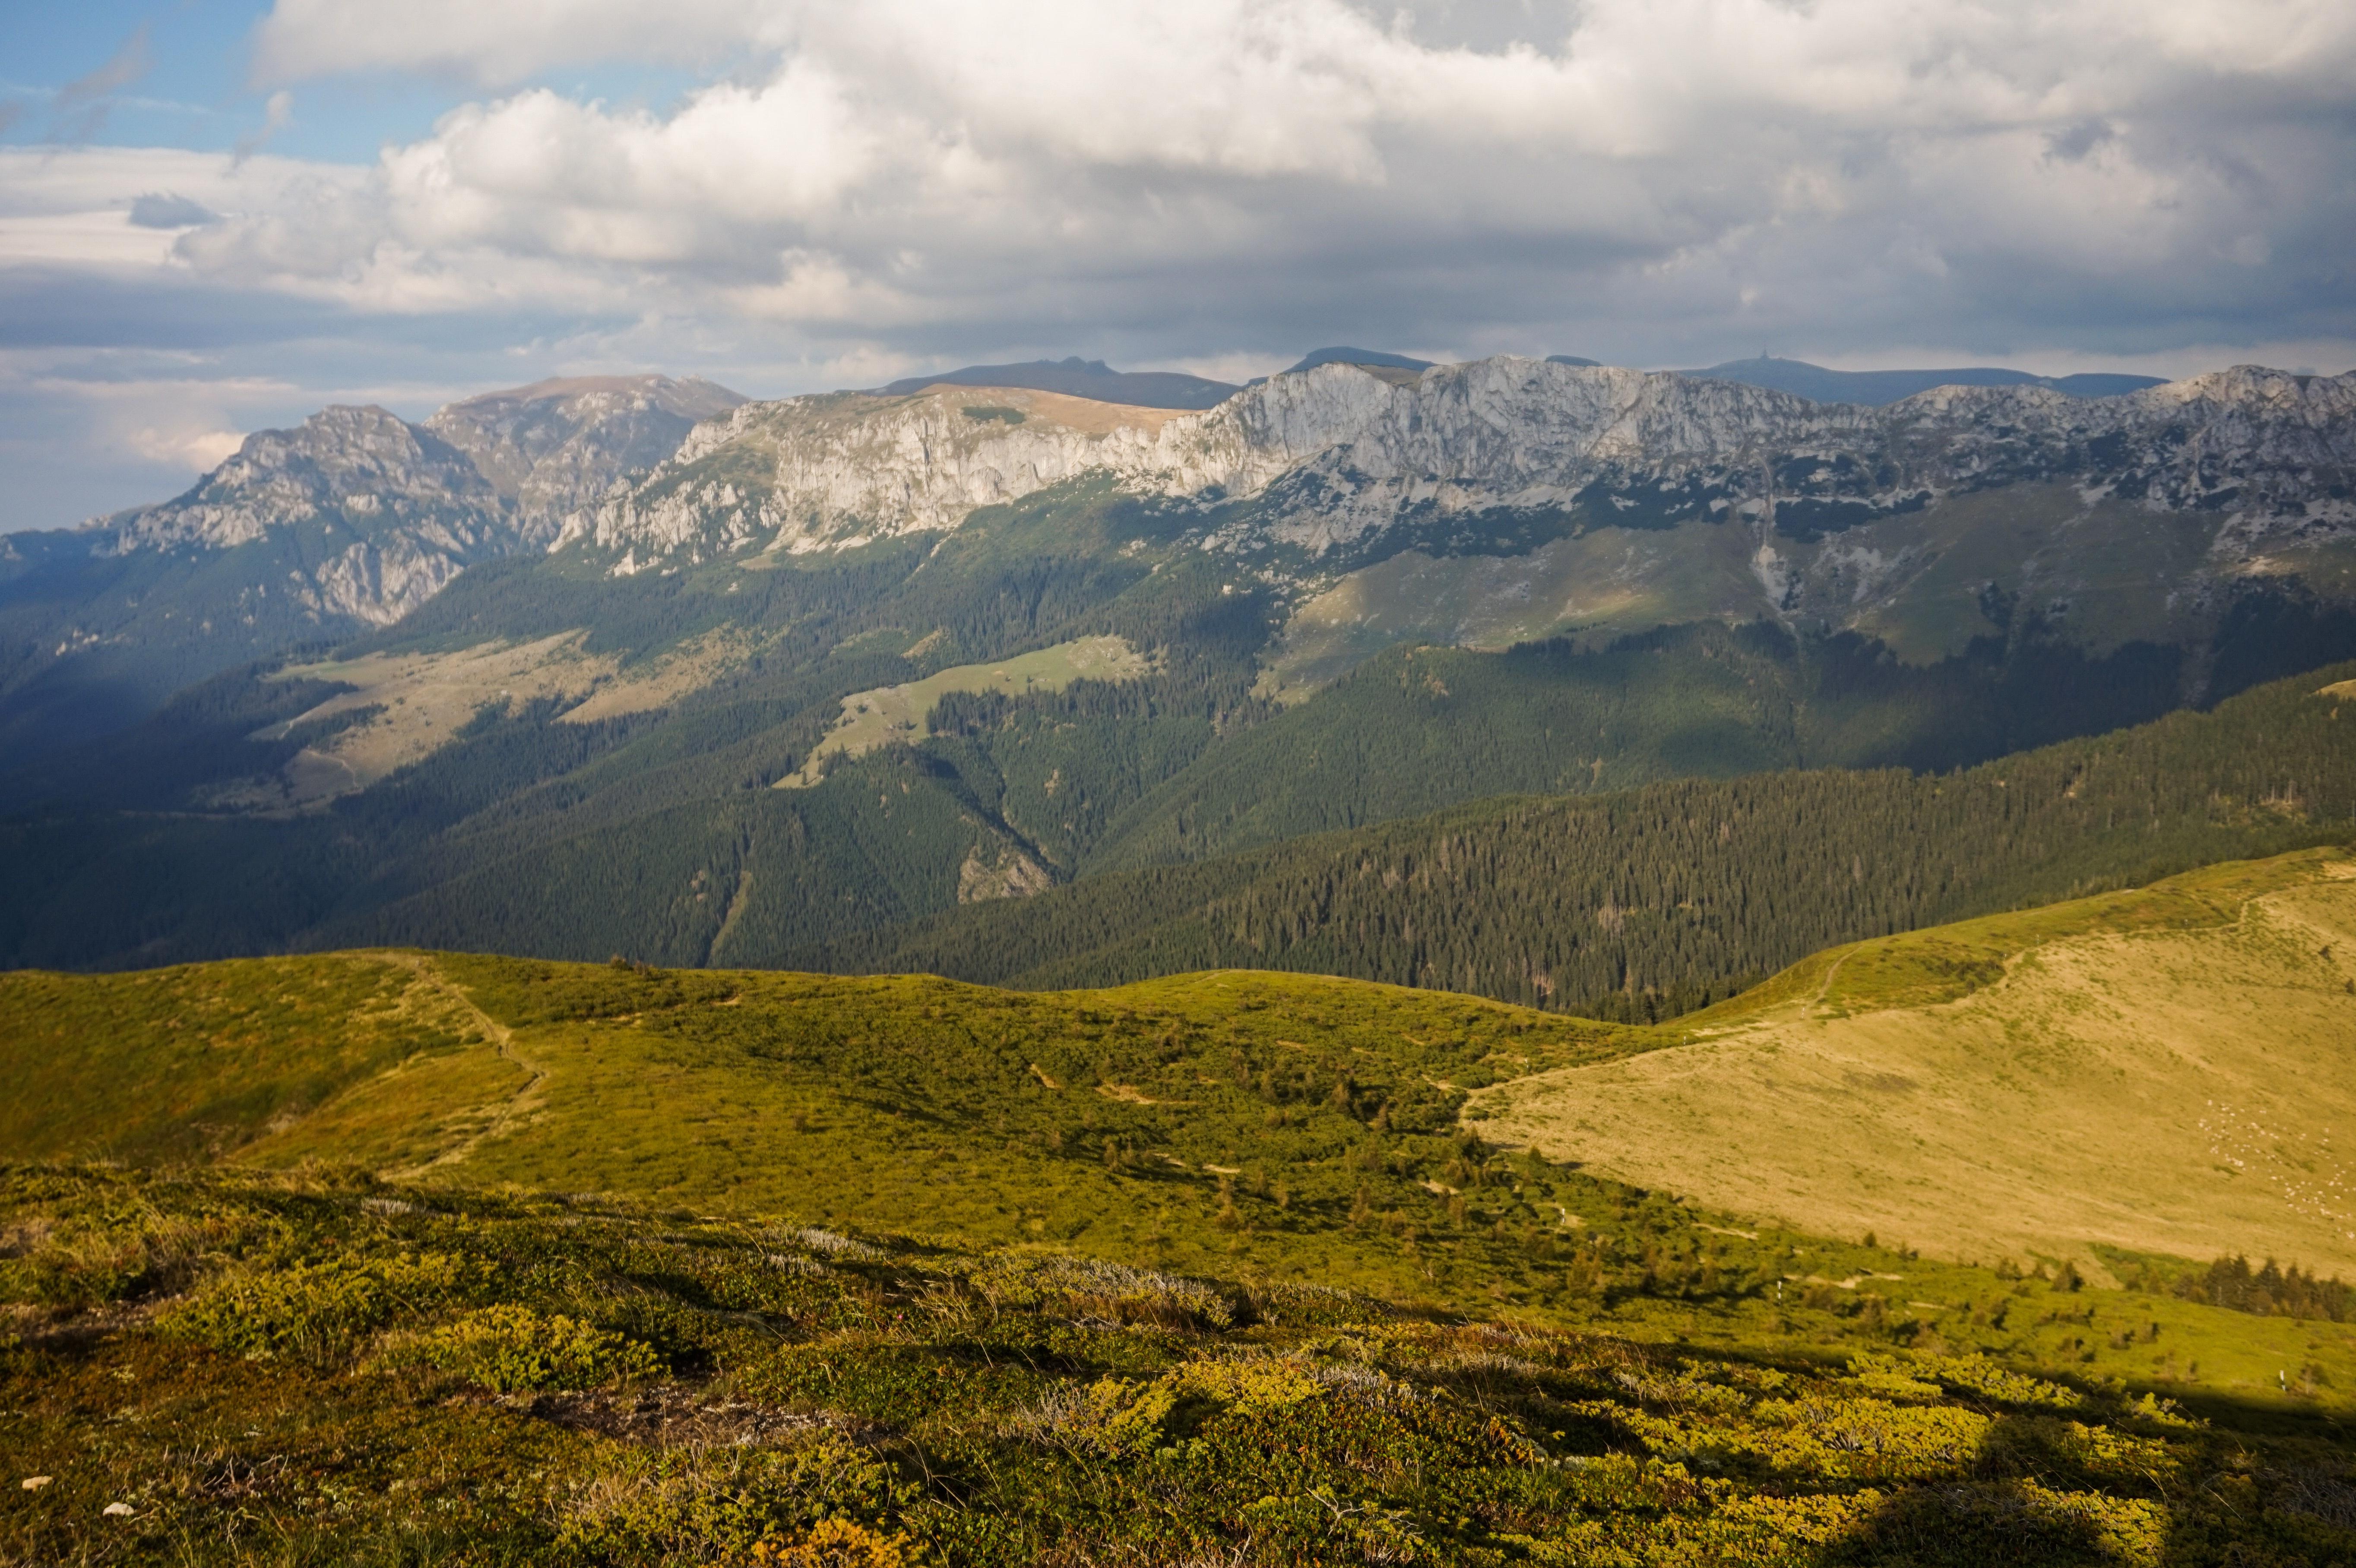 Green mountain range under cloudy skies photo